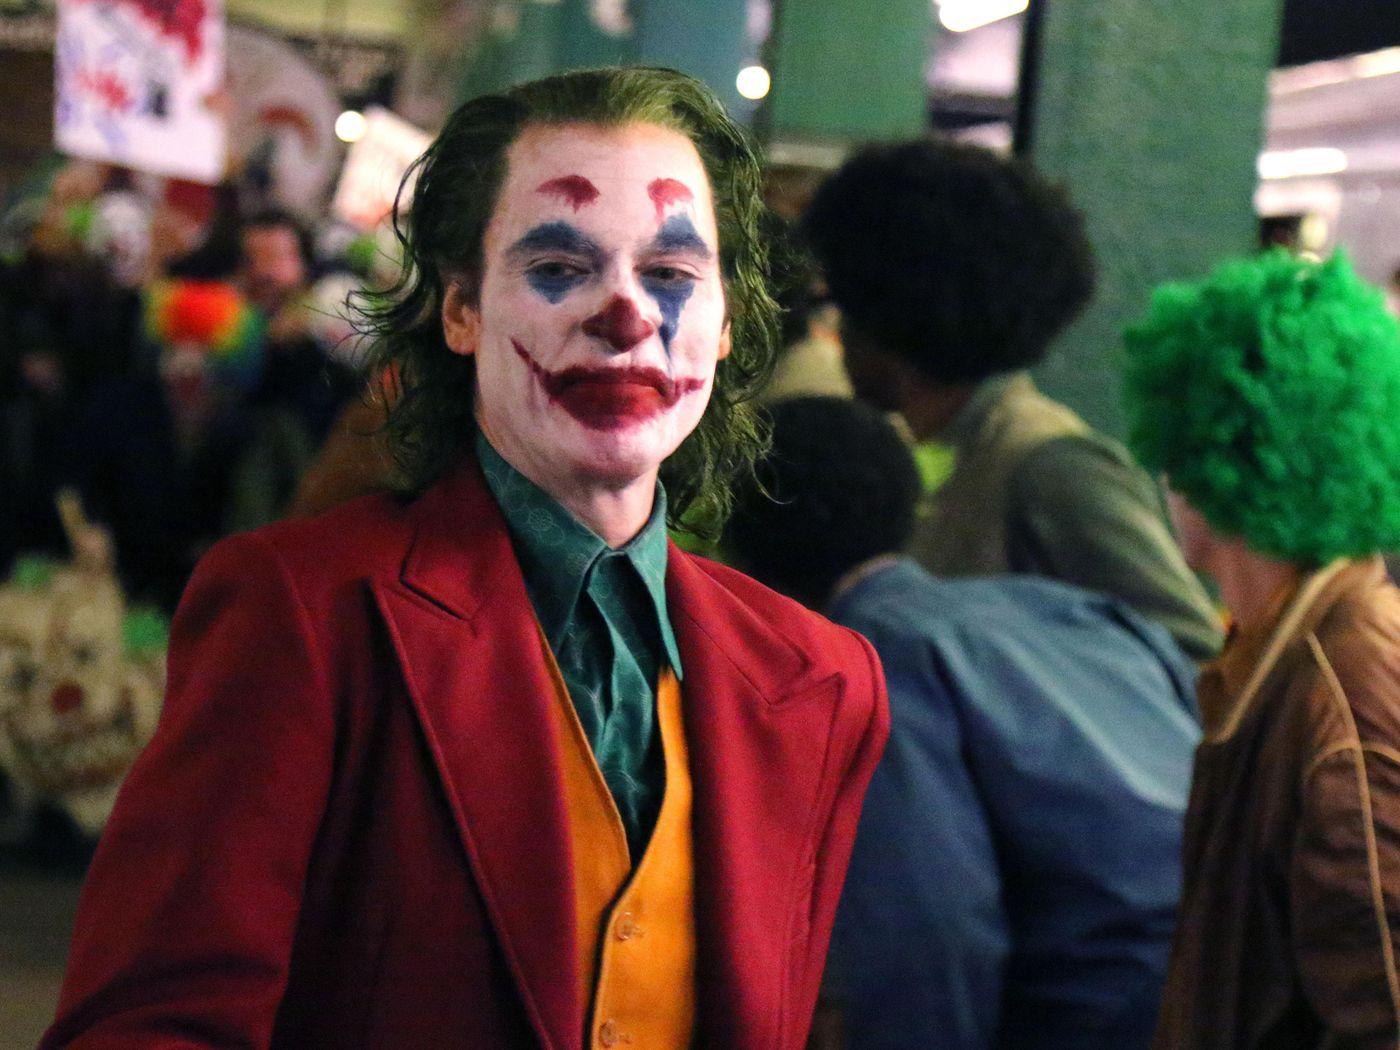 Download Film Joker 2019 Bluray MKV 480p 720p 1080p Sub